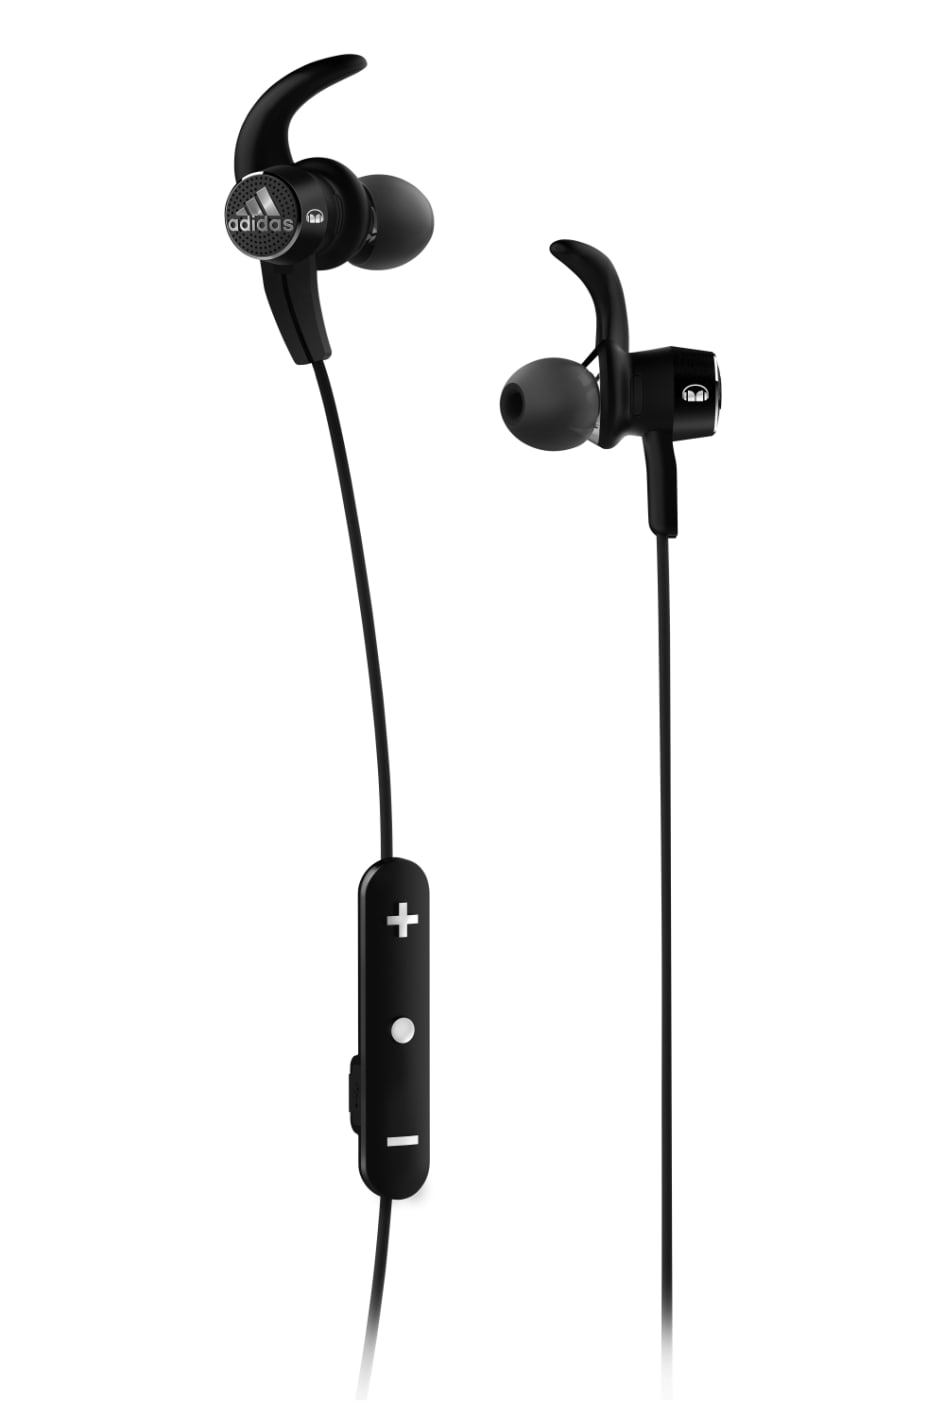 Monster adidas Sport adistar In Ear Wireless Headphones Black